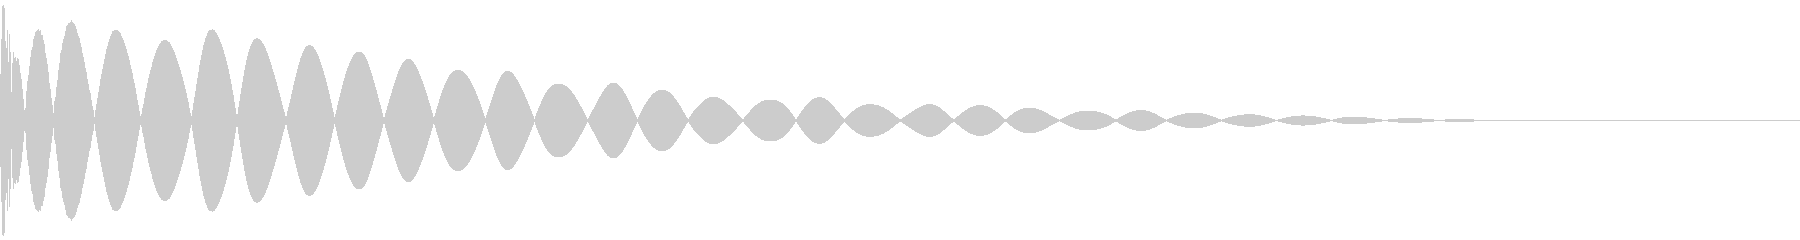 DTM Kick 83 オリジナル音源の未再生の波形